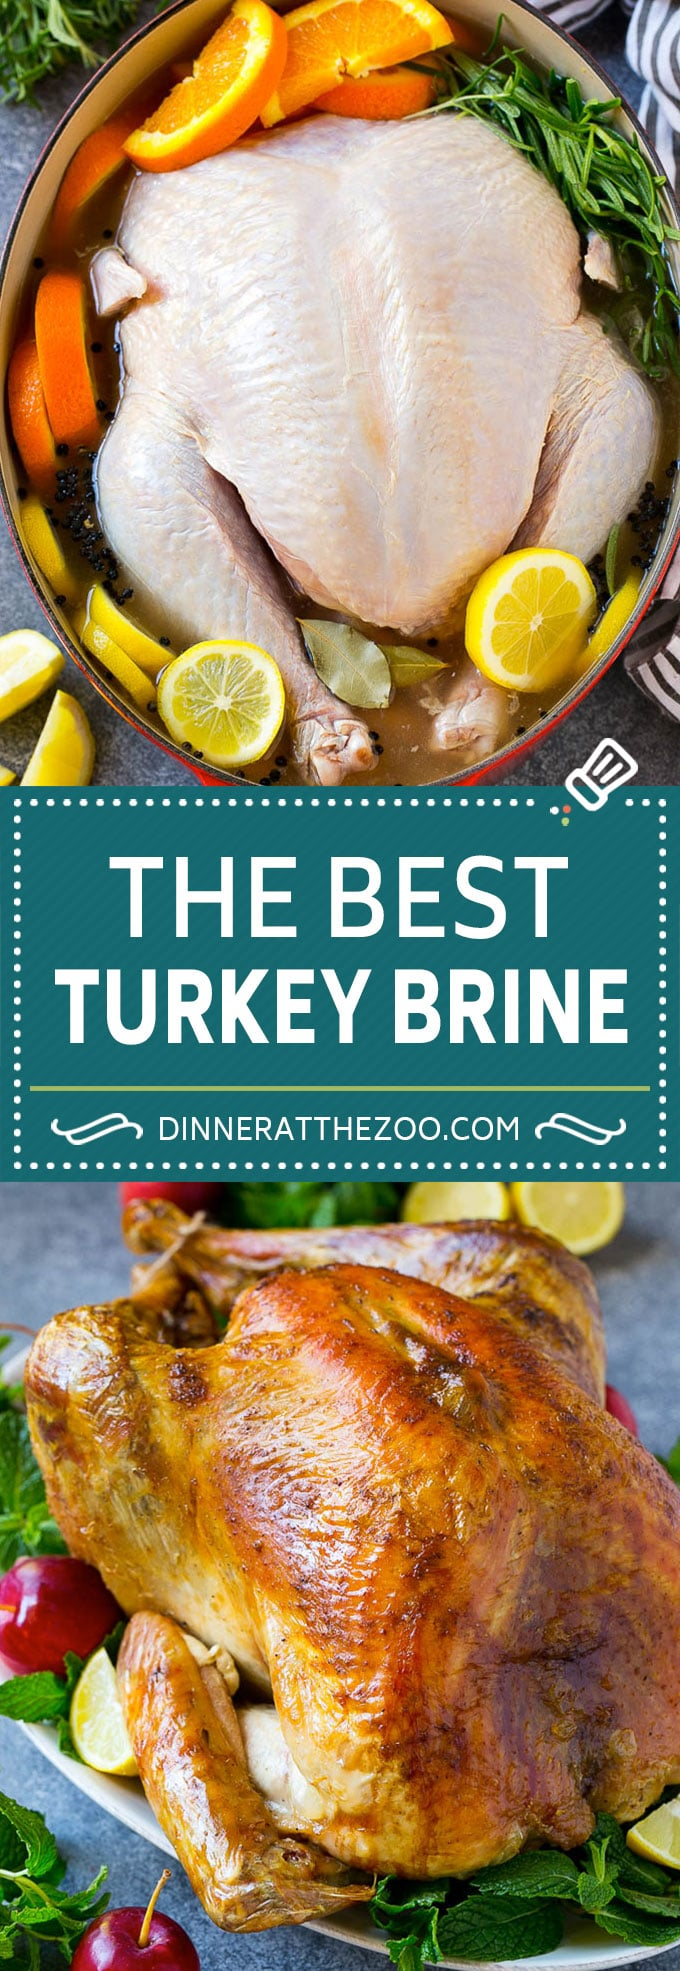 Turkey Brine Recipe | Brined Turkey | Roasted Turkey | Thanksgiving Turkey